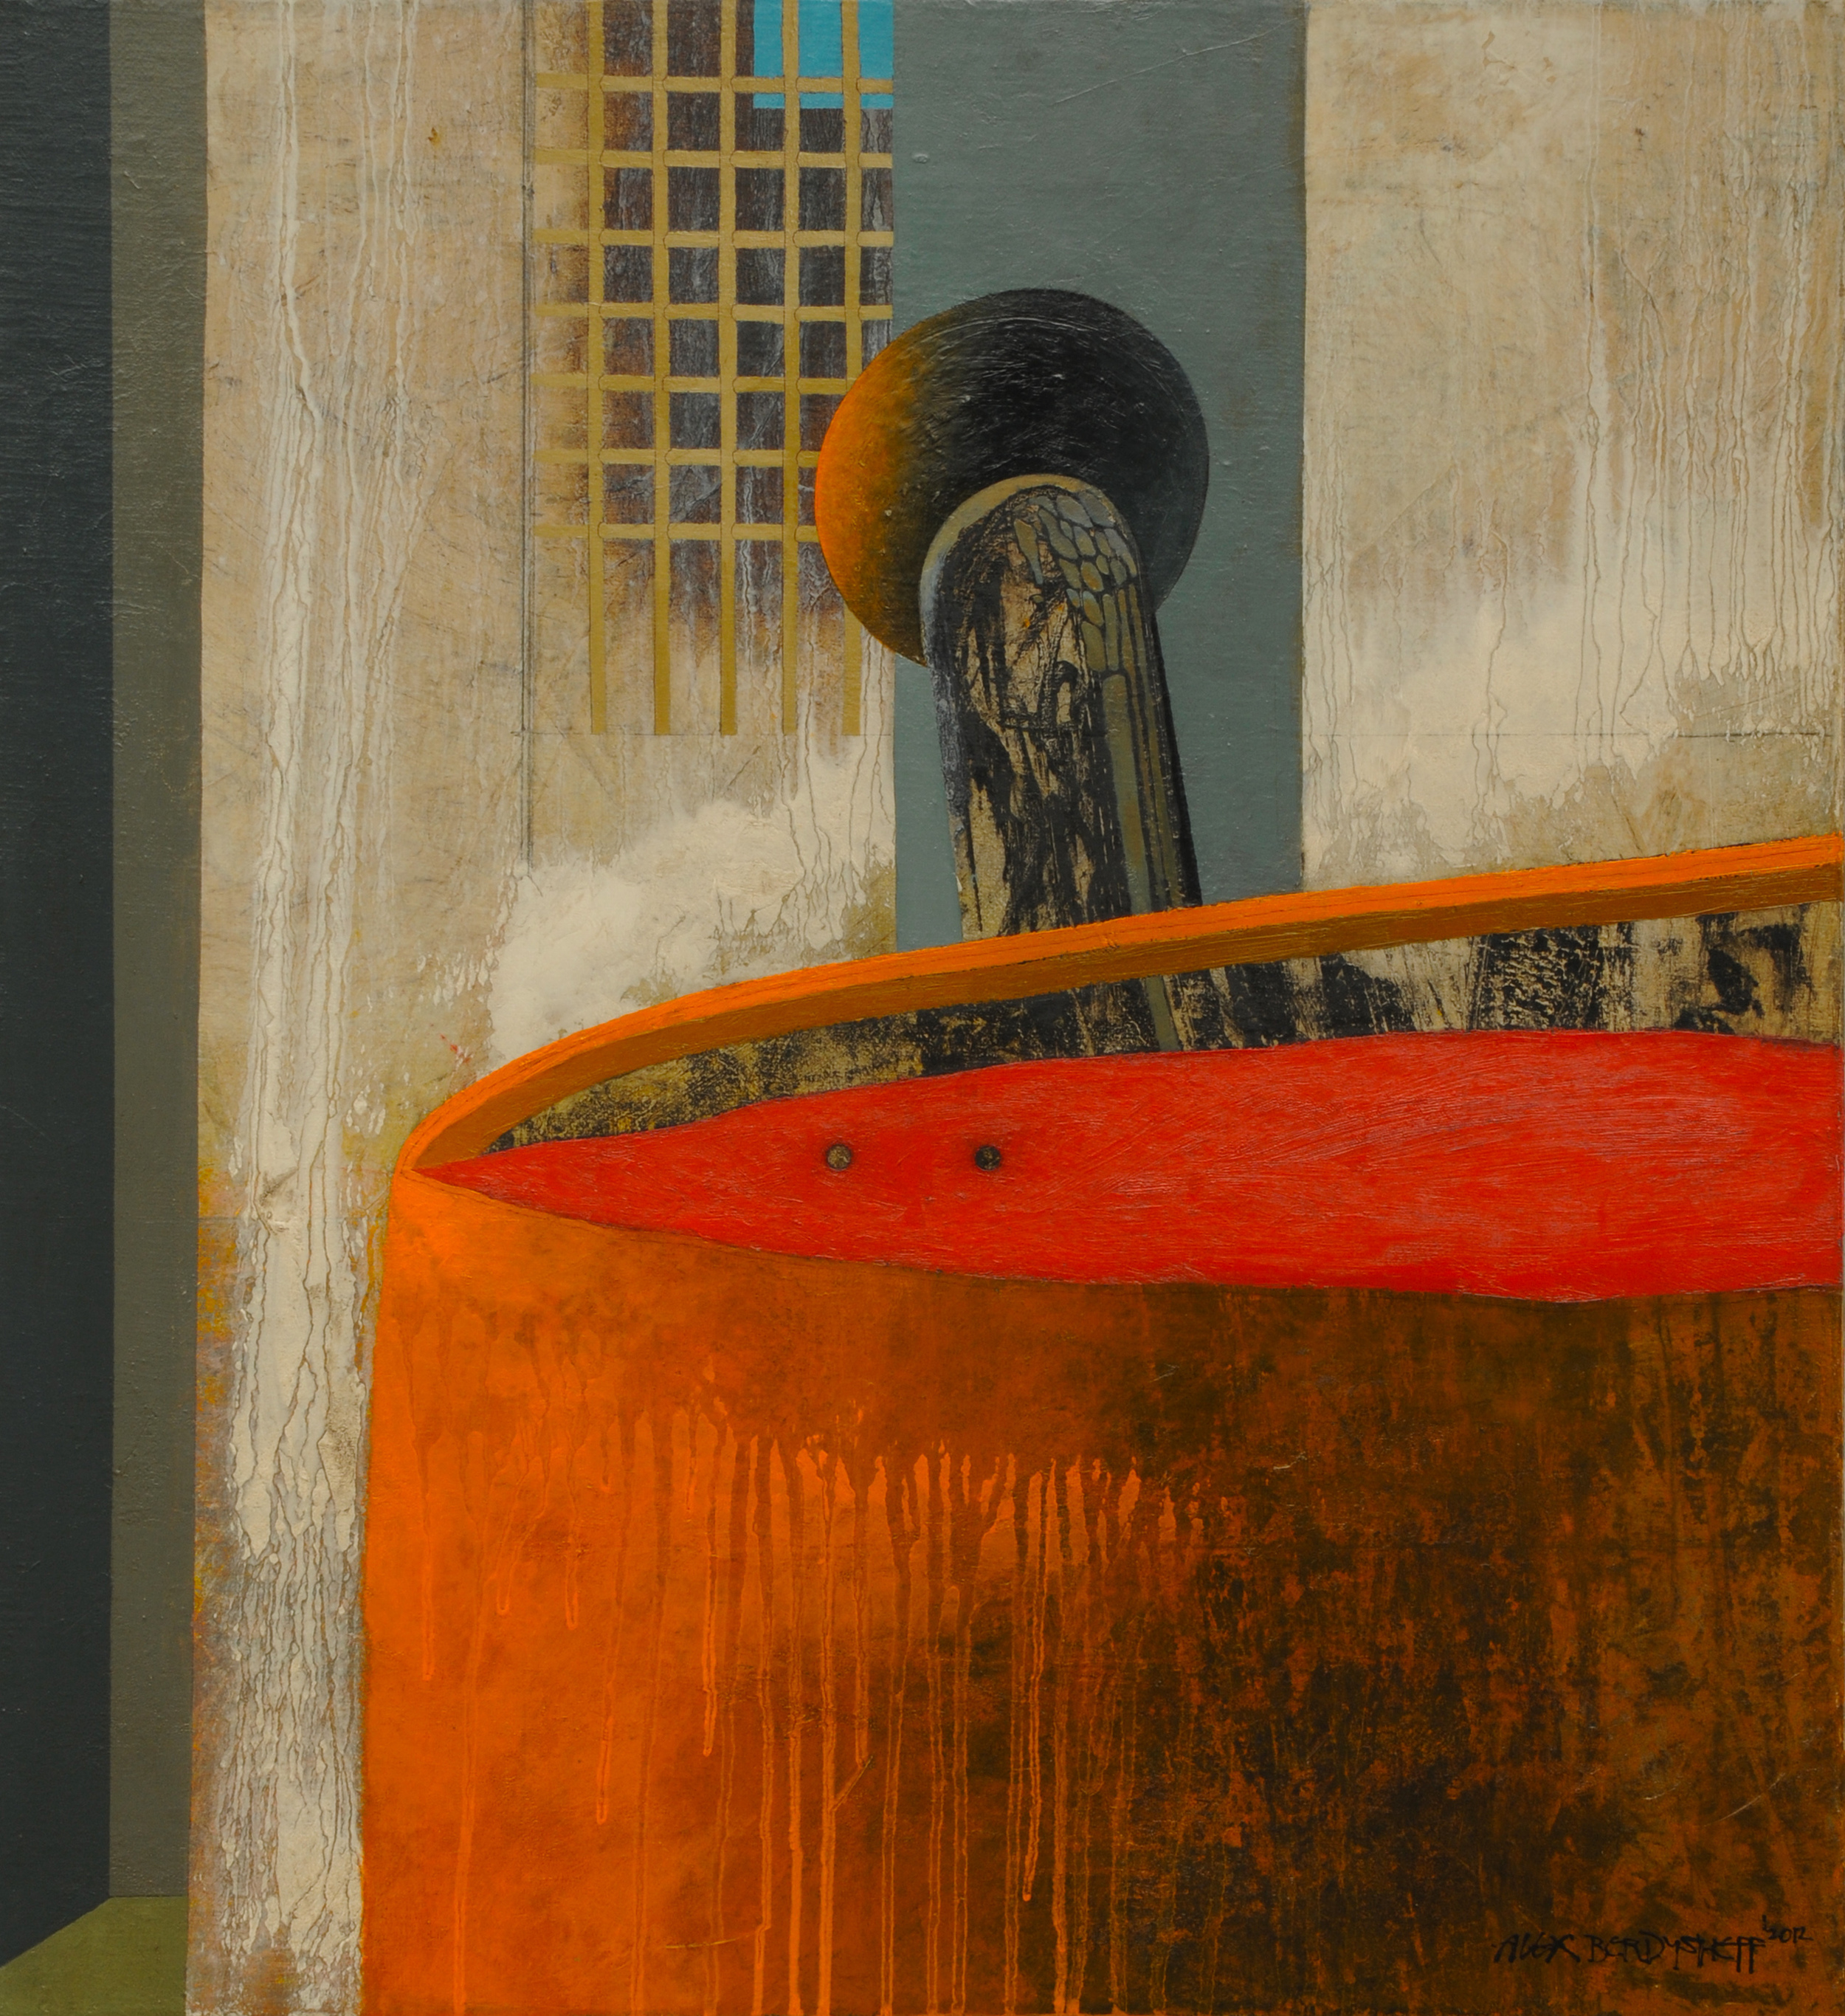 Prison Break, oil on canvas, 60x55 cm, 2012